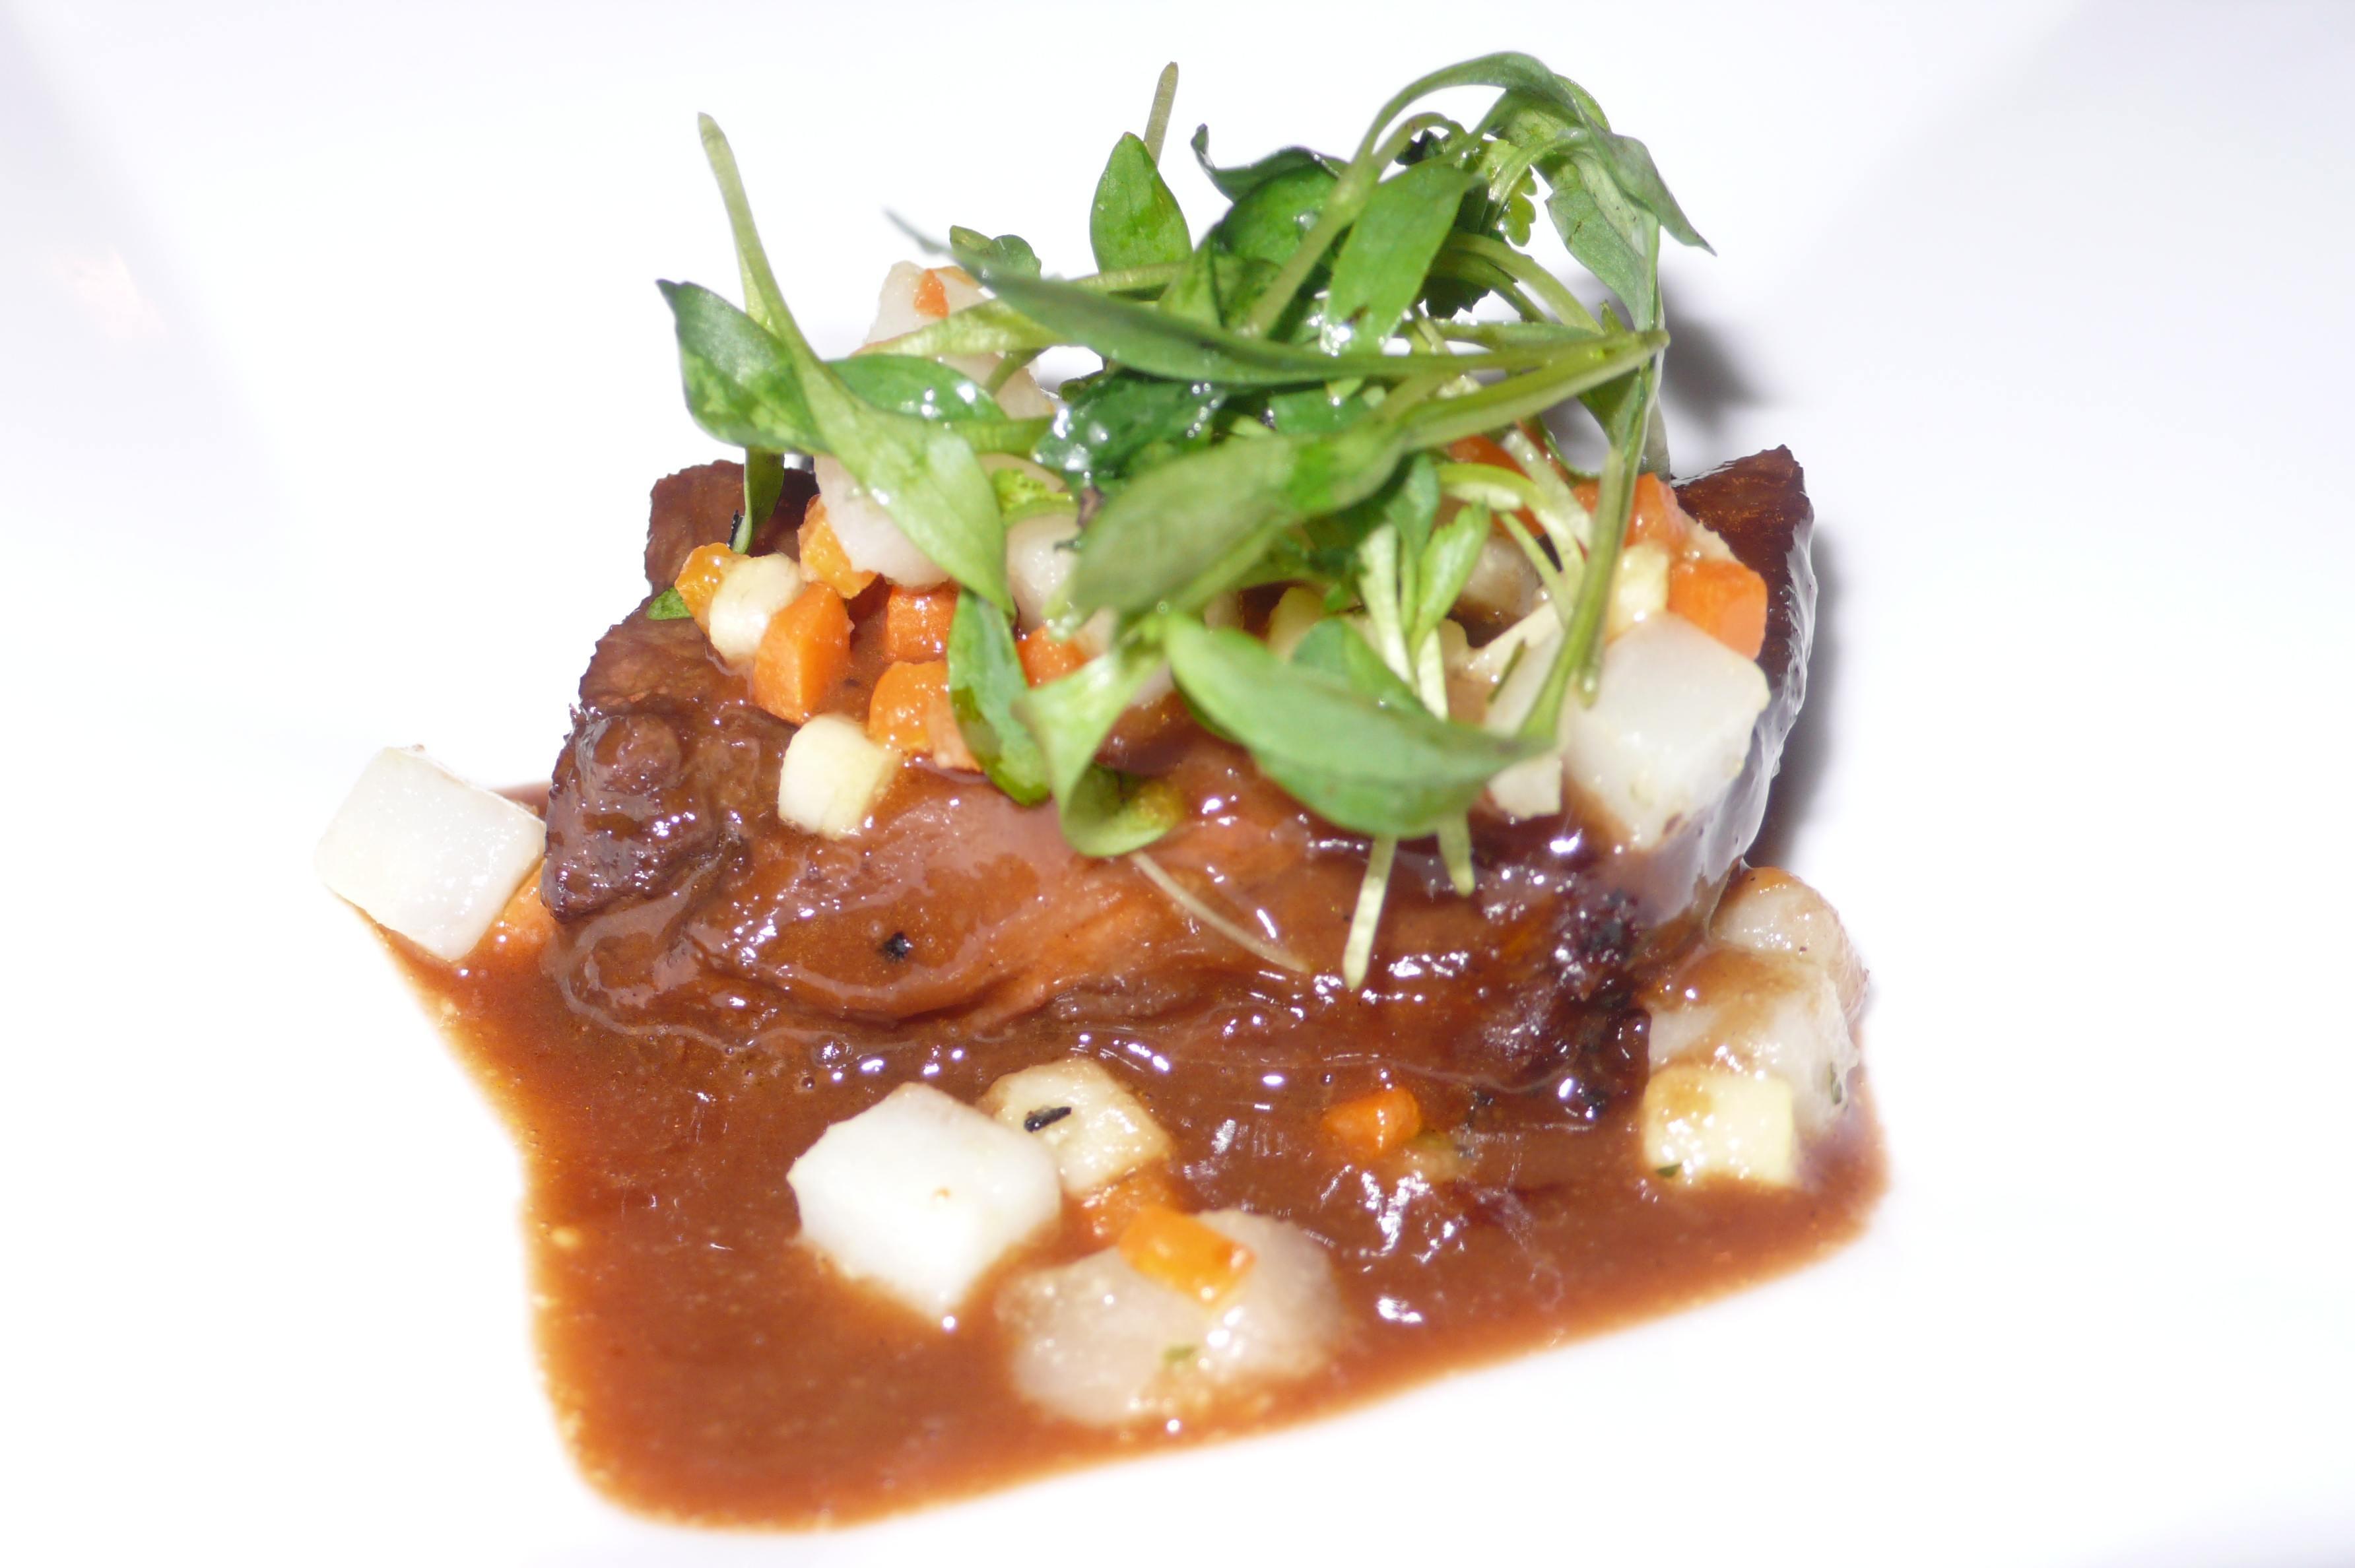 Slow braised short rib with pastroville artochoke and micro cilantro salad